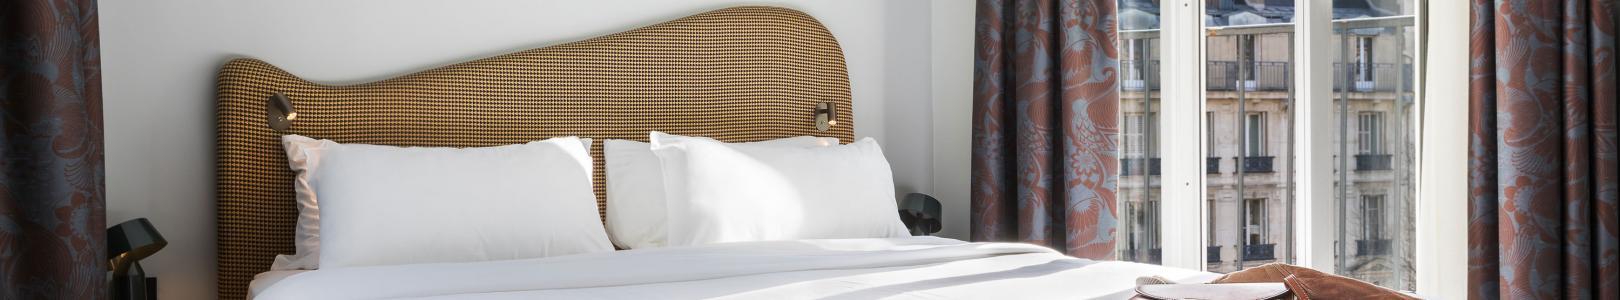 Hotel Belloy - Chambre